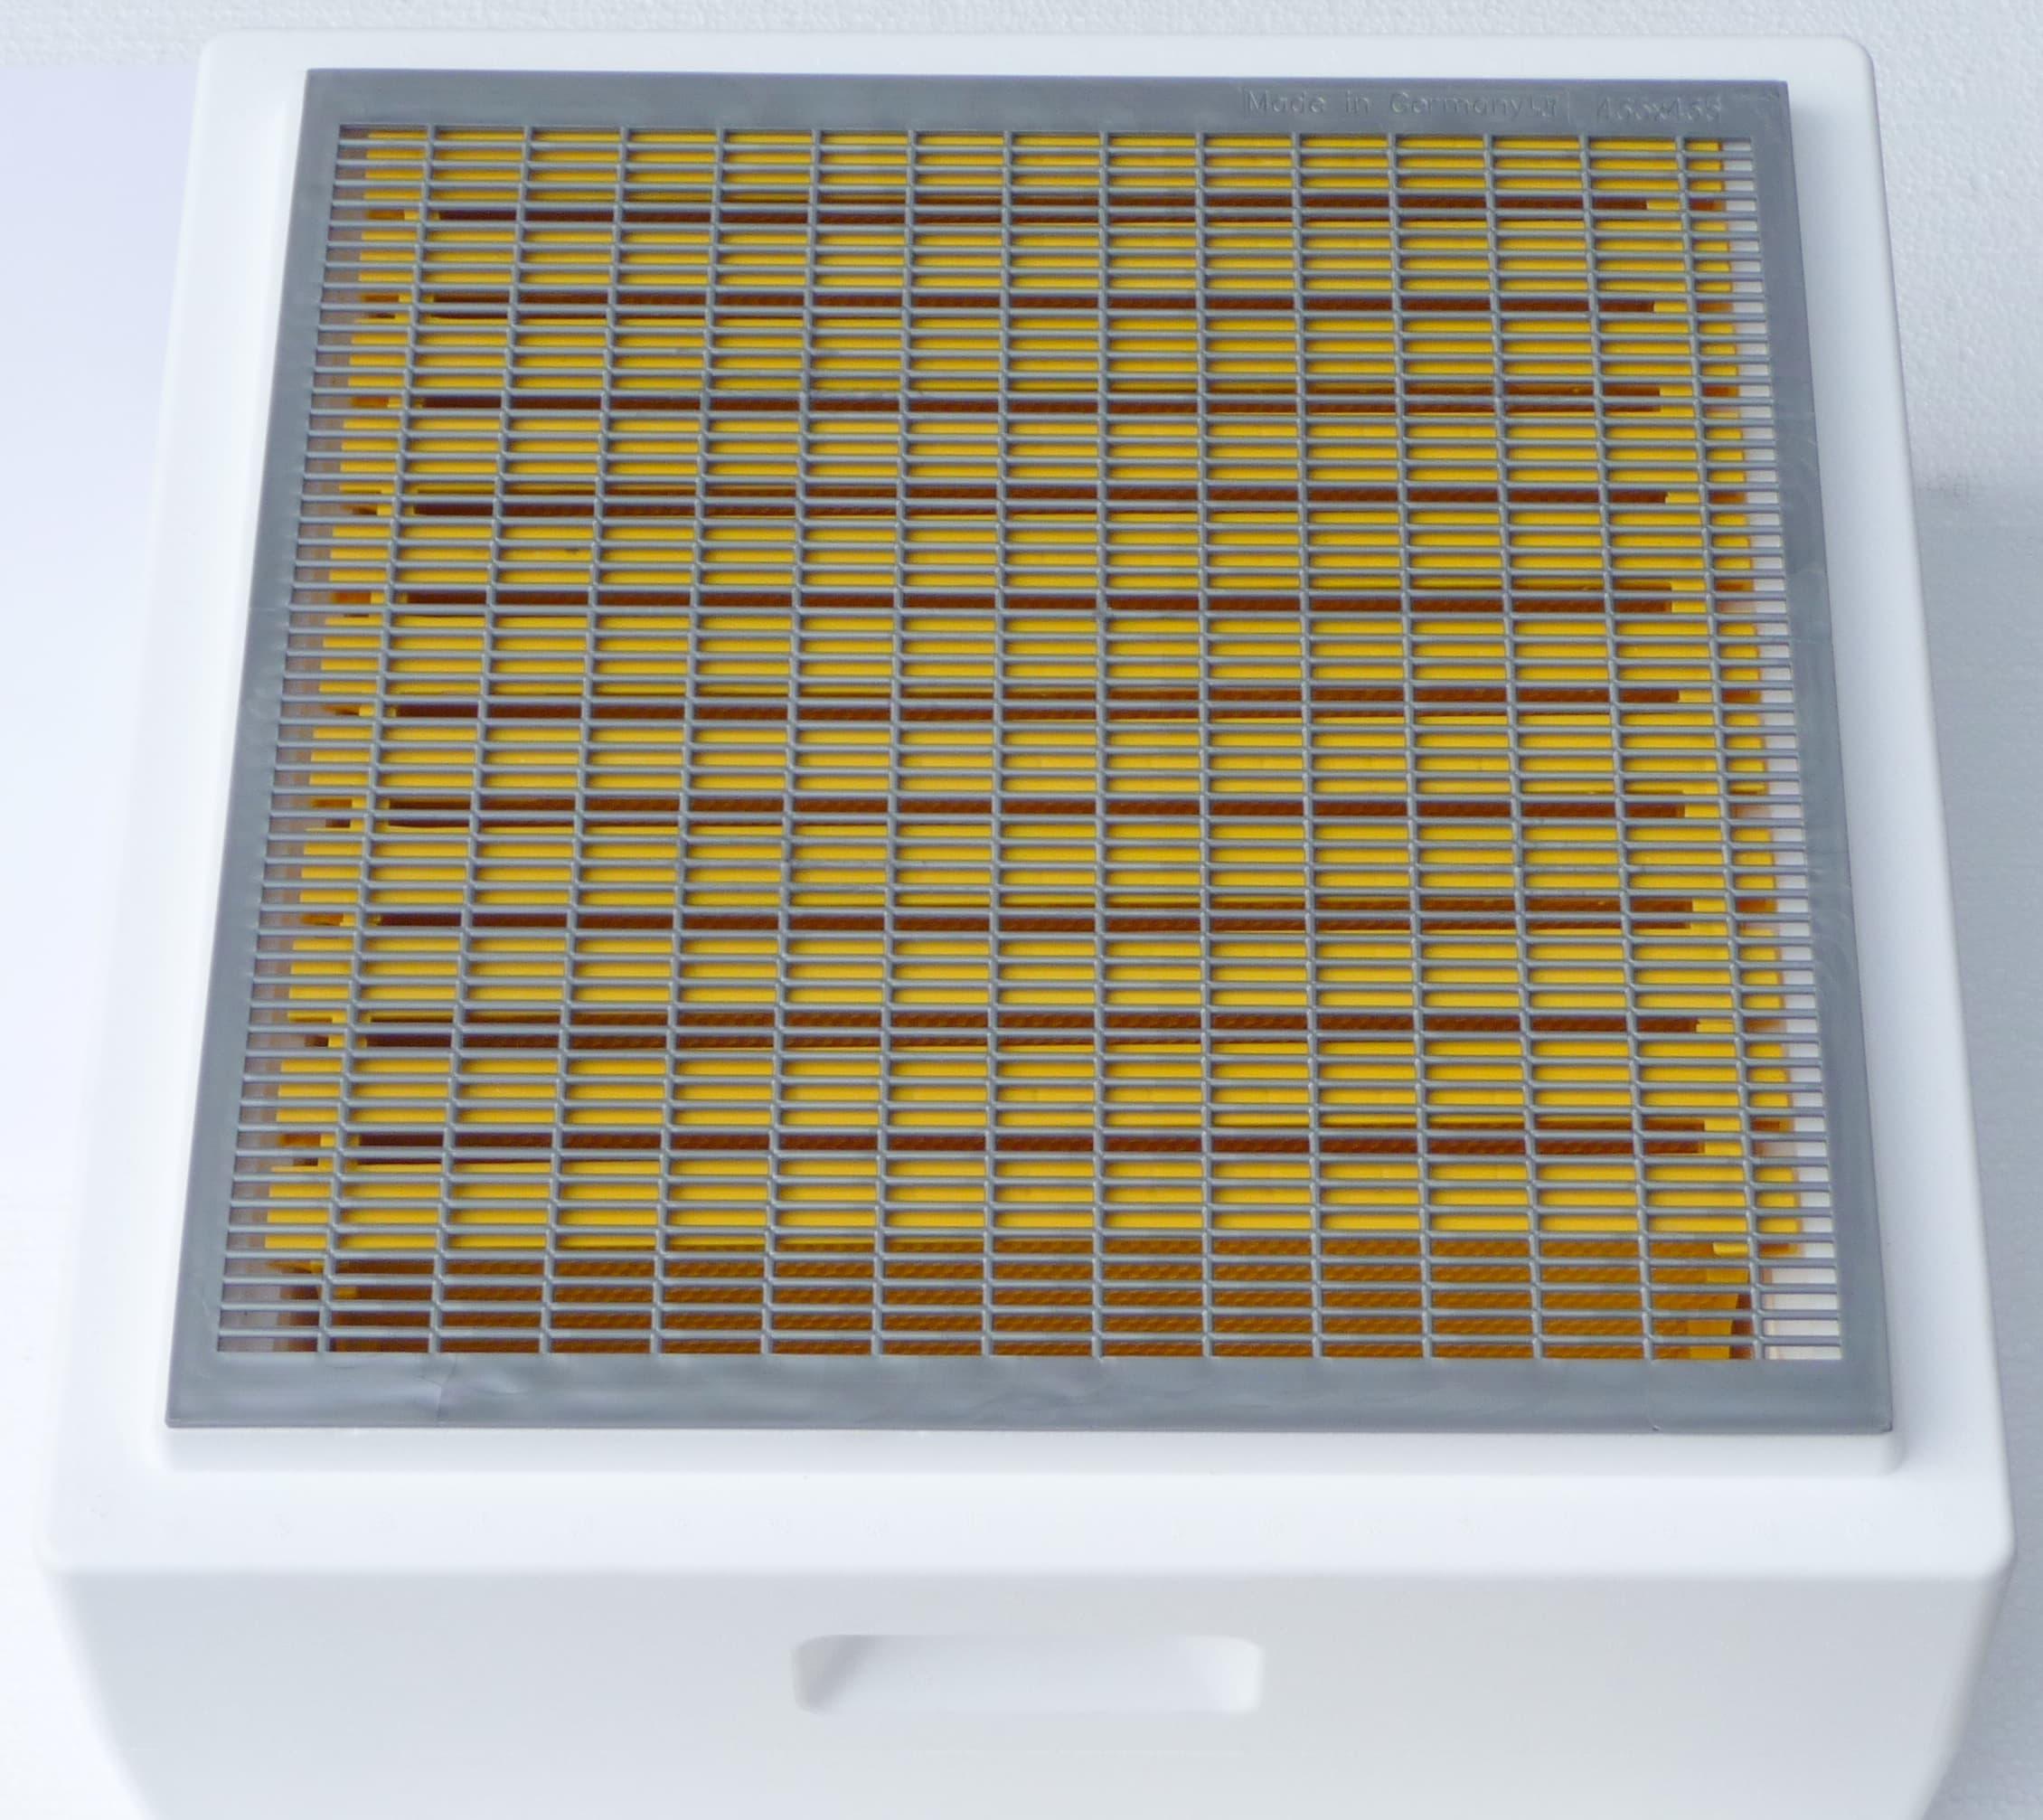 Absperrgitter Kunststoff, 477 x 405, Herold,  neue Ausführung, s